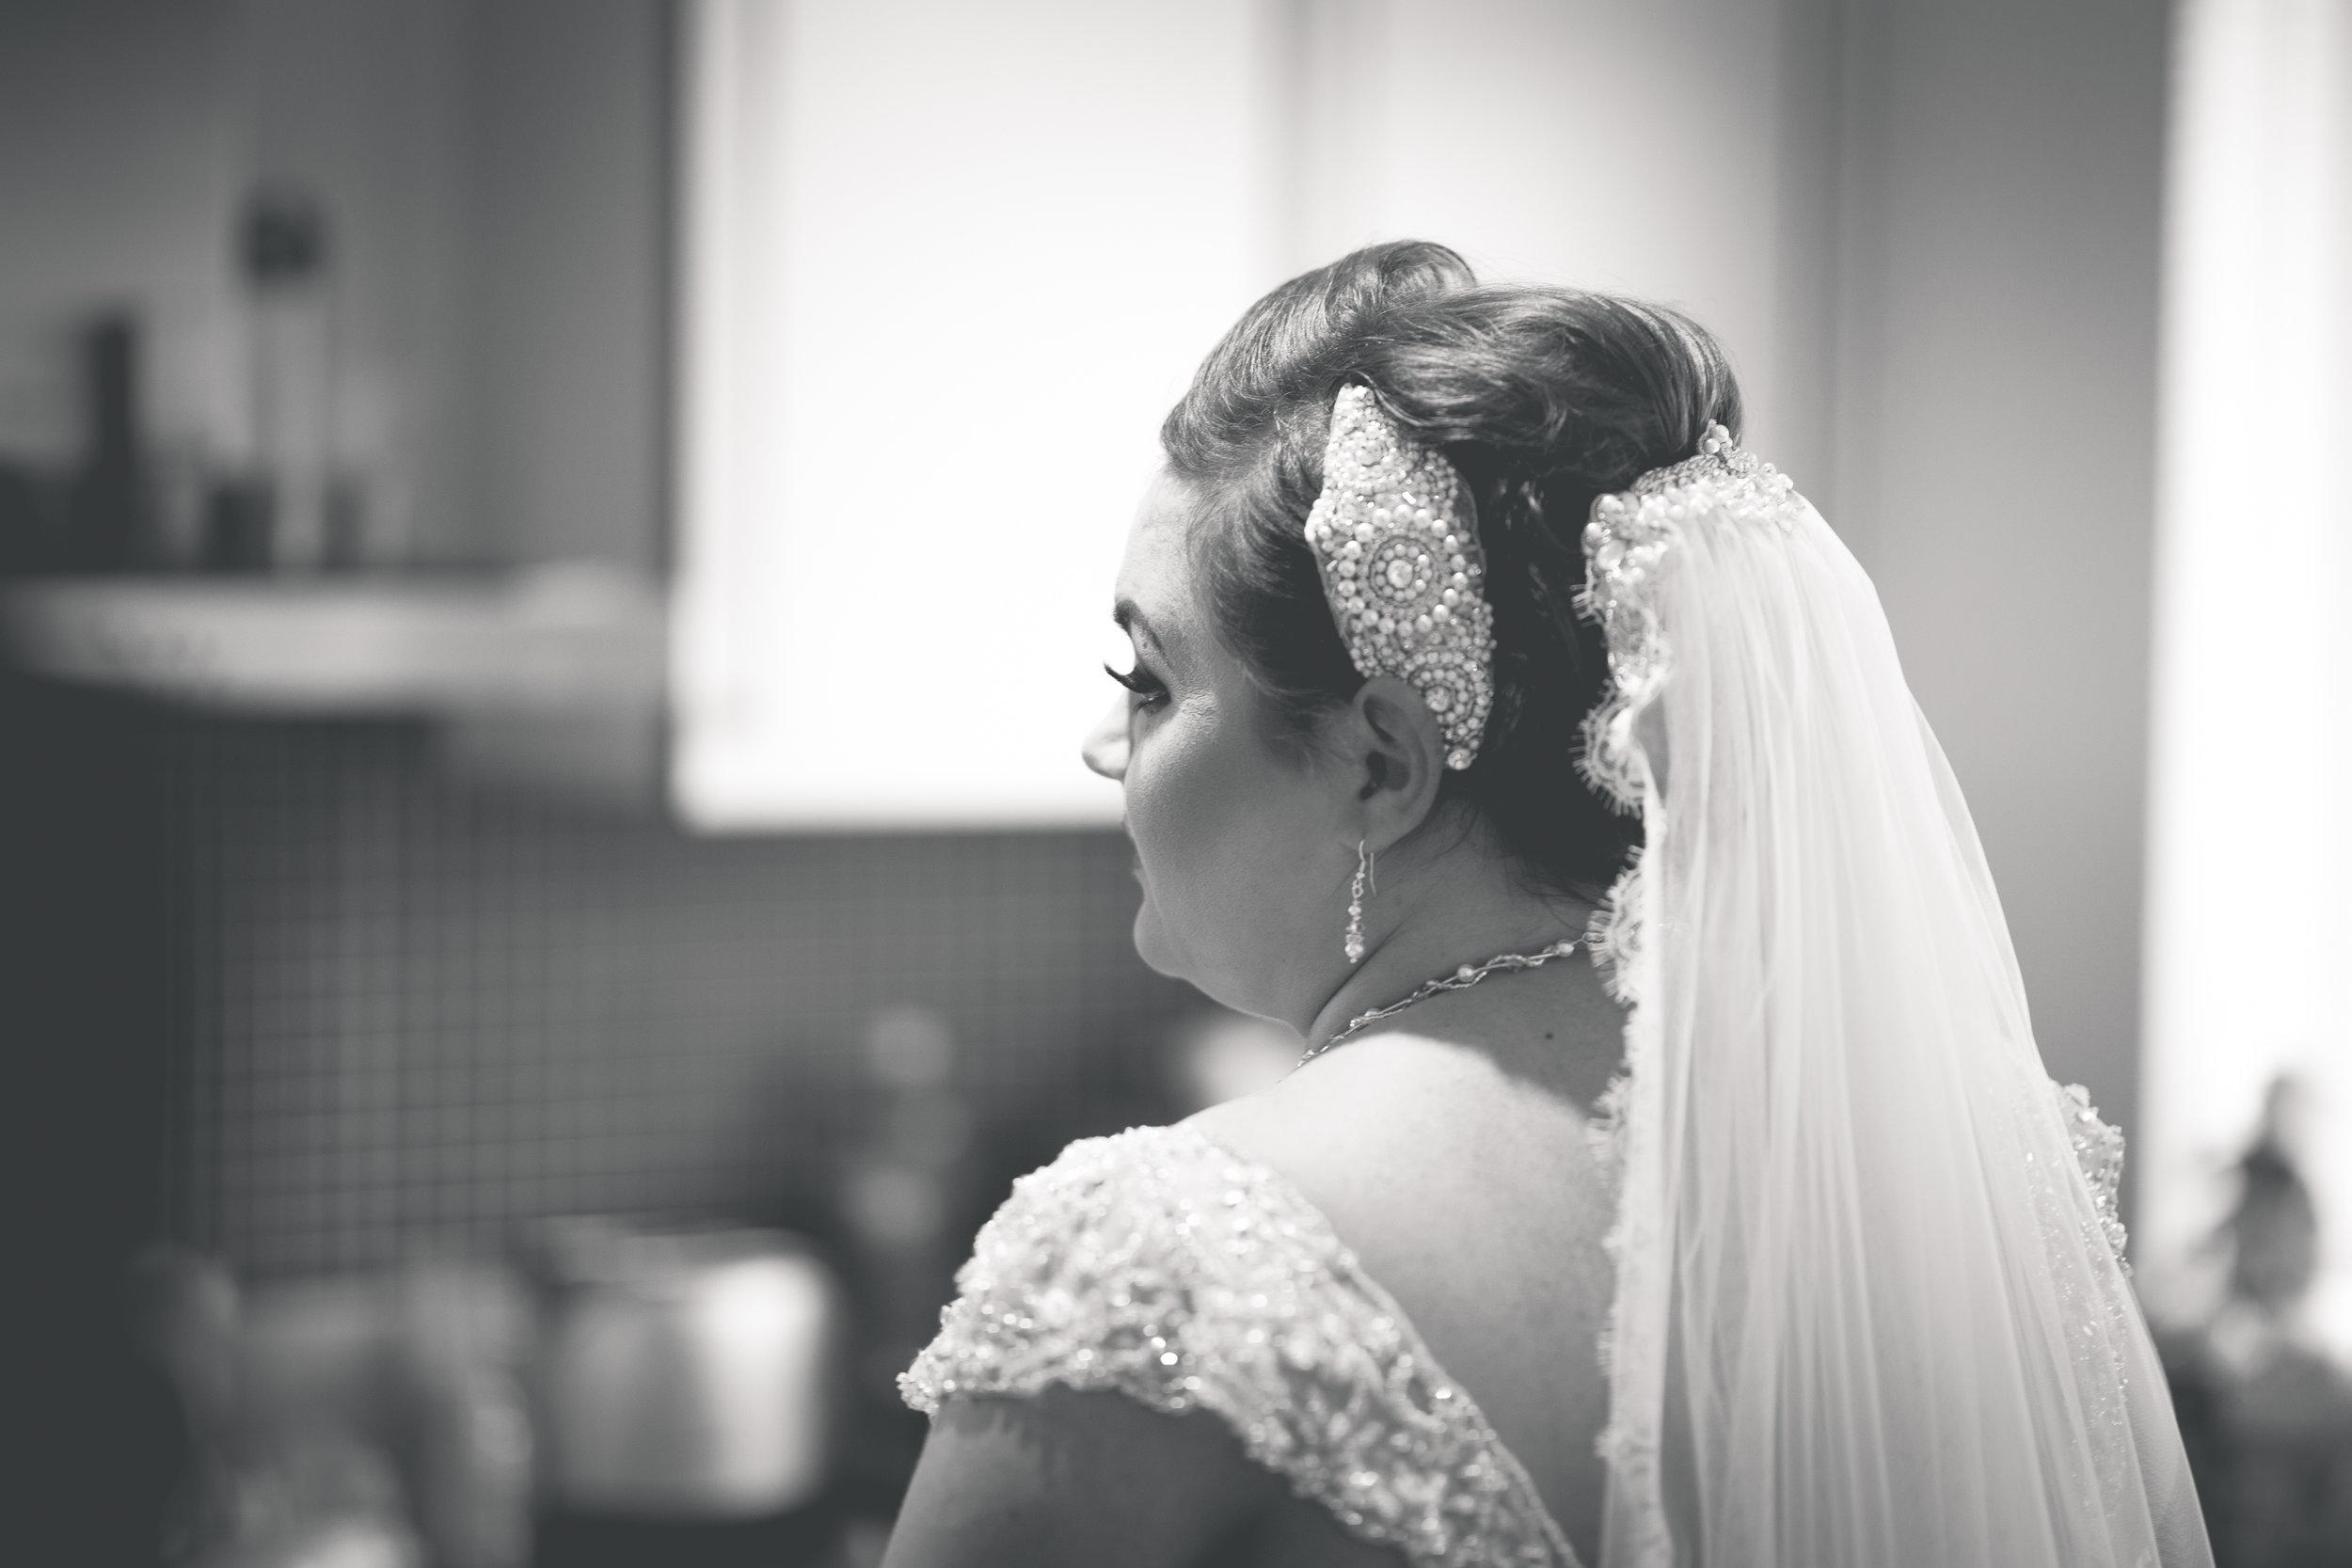 Antoinette & Stephen - Bridal Preparations | Brian McEwan Photography | Wedding Photographer Northern Ireland 188.jpg